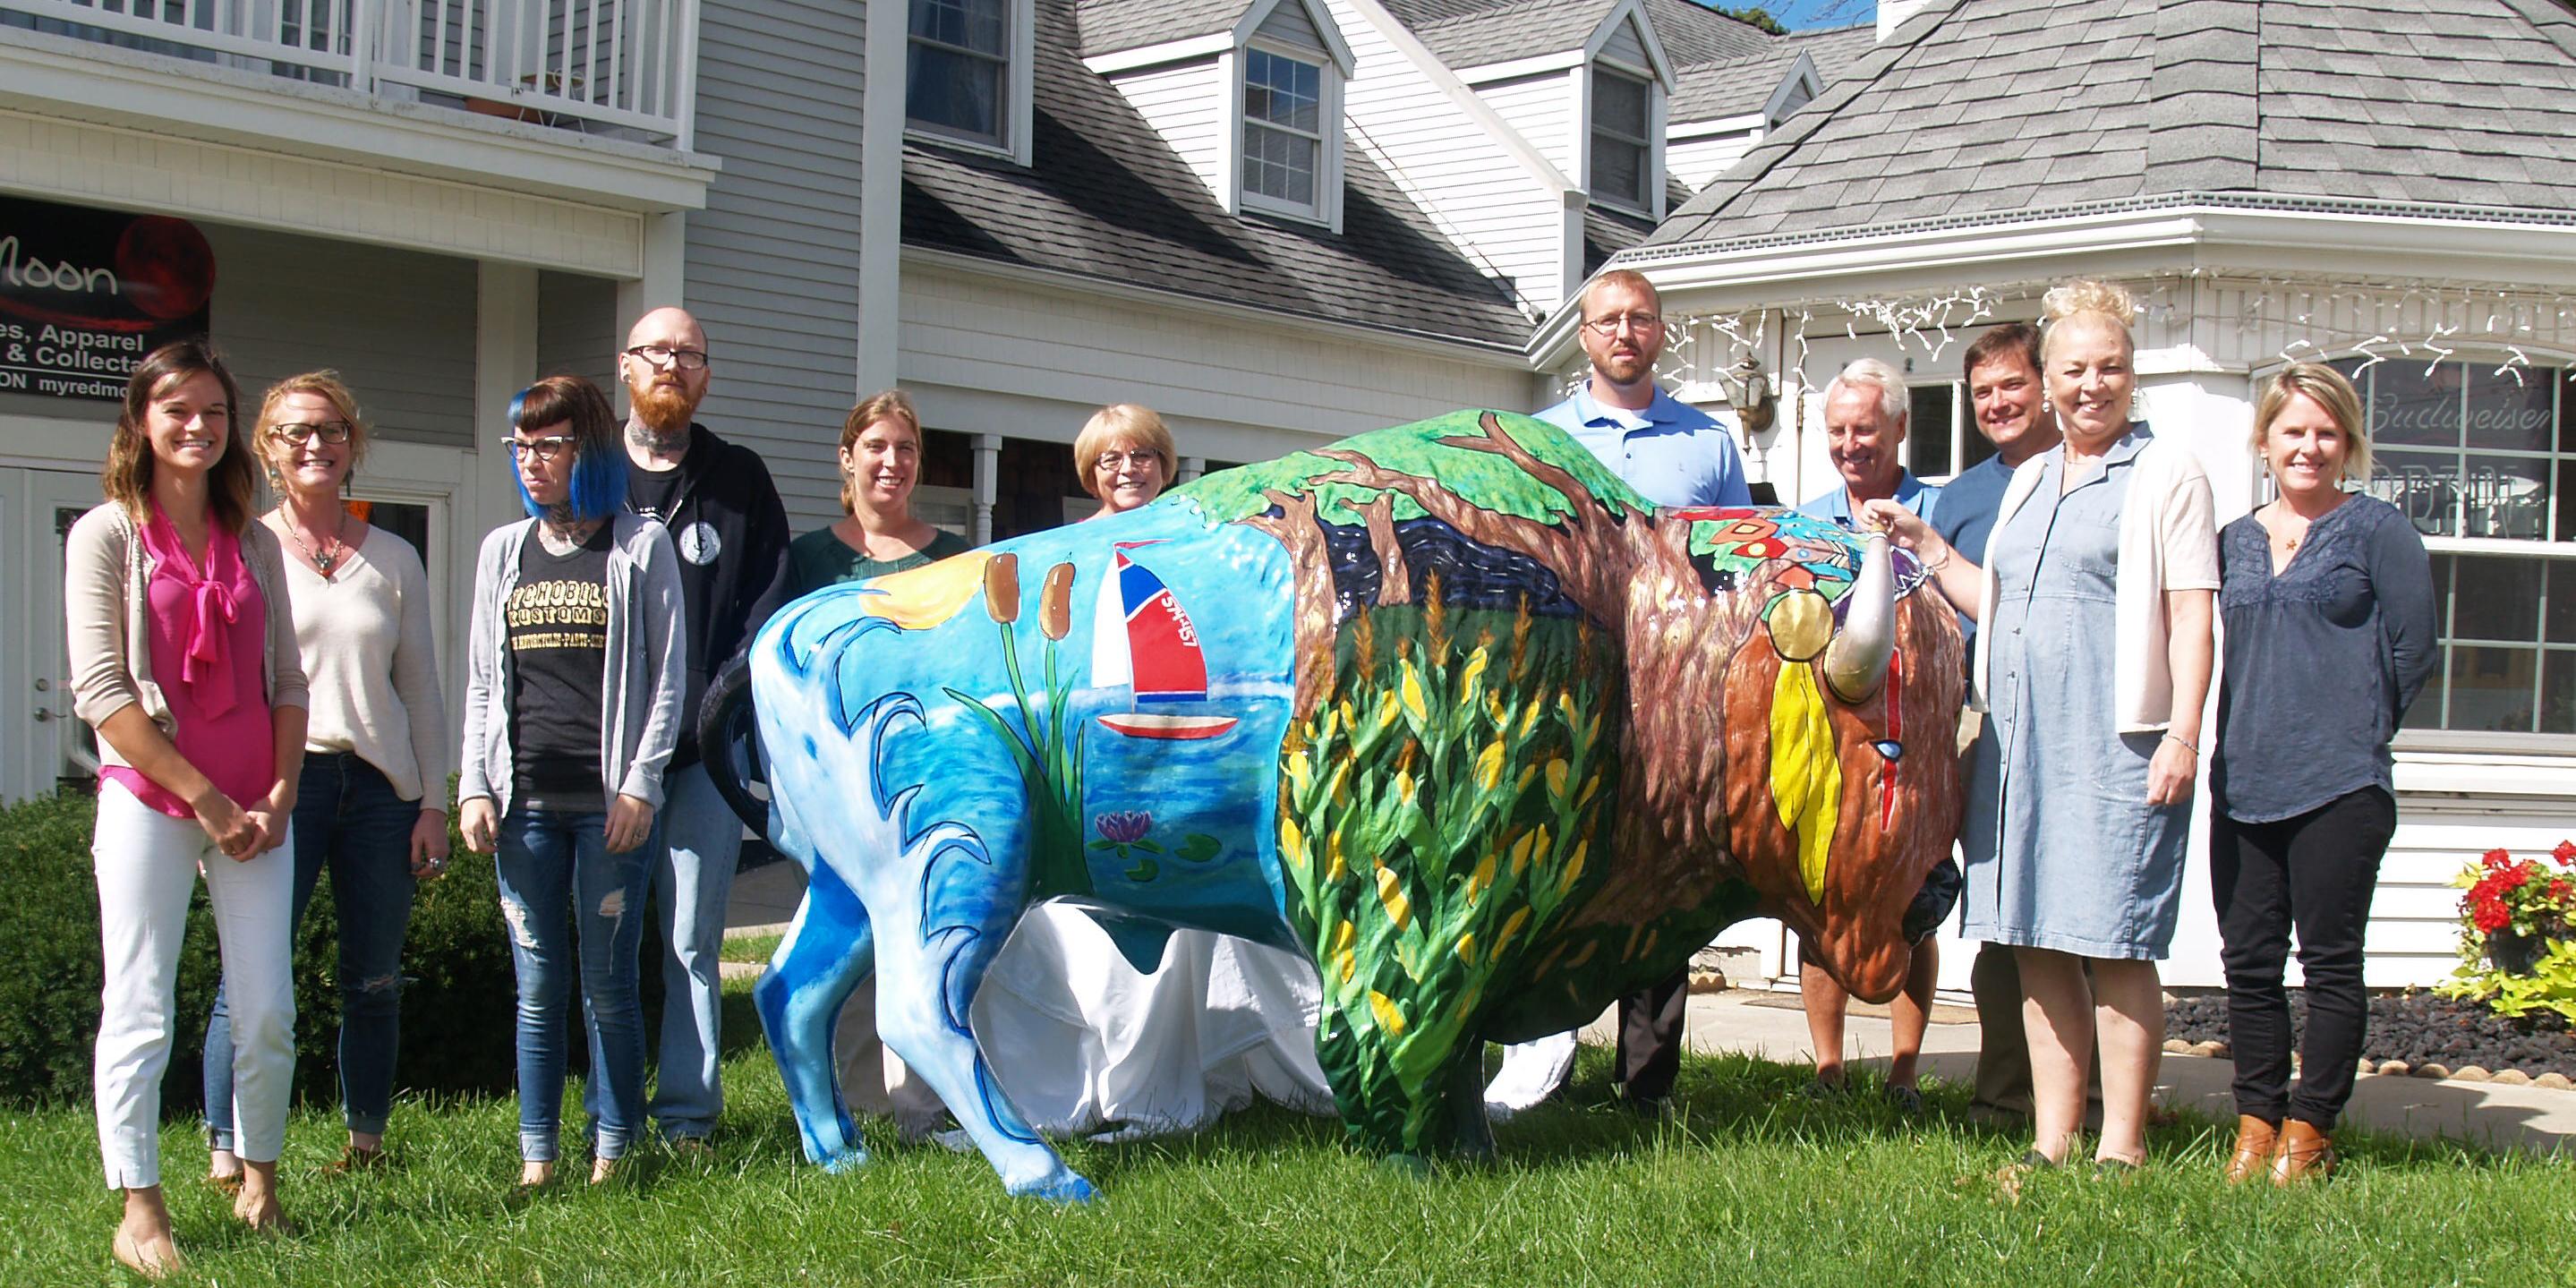 Indiana kosciusko county syracuse - Photos Of Kosciusko County Bison Chief The Bison